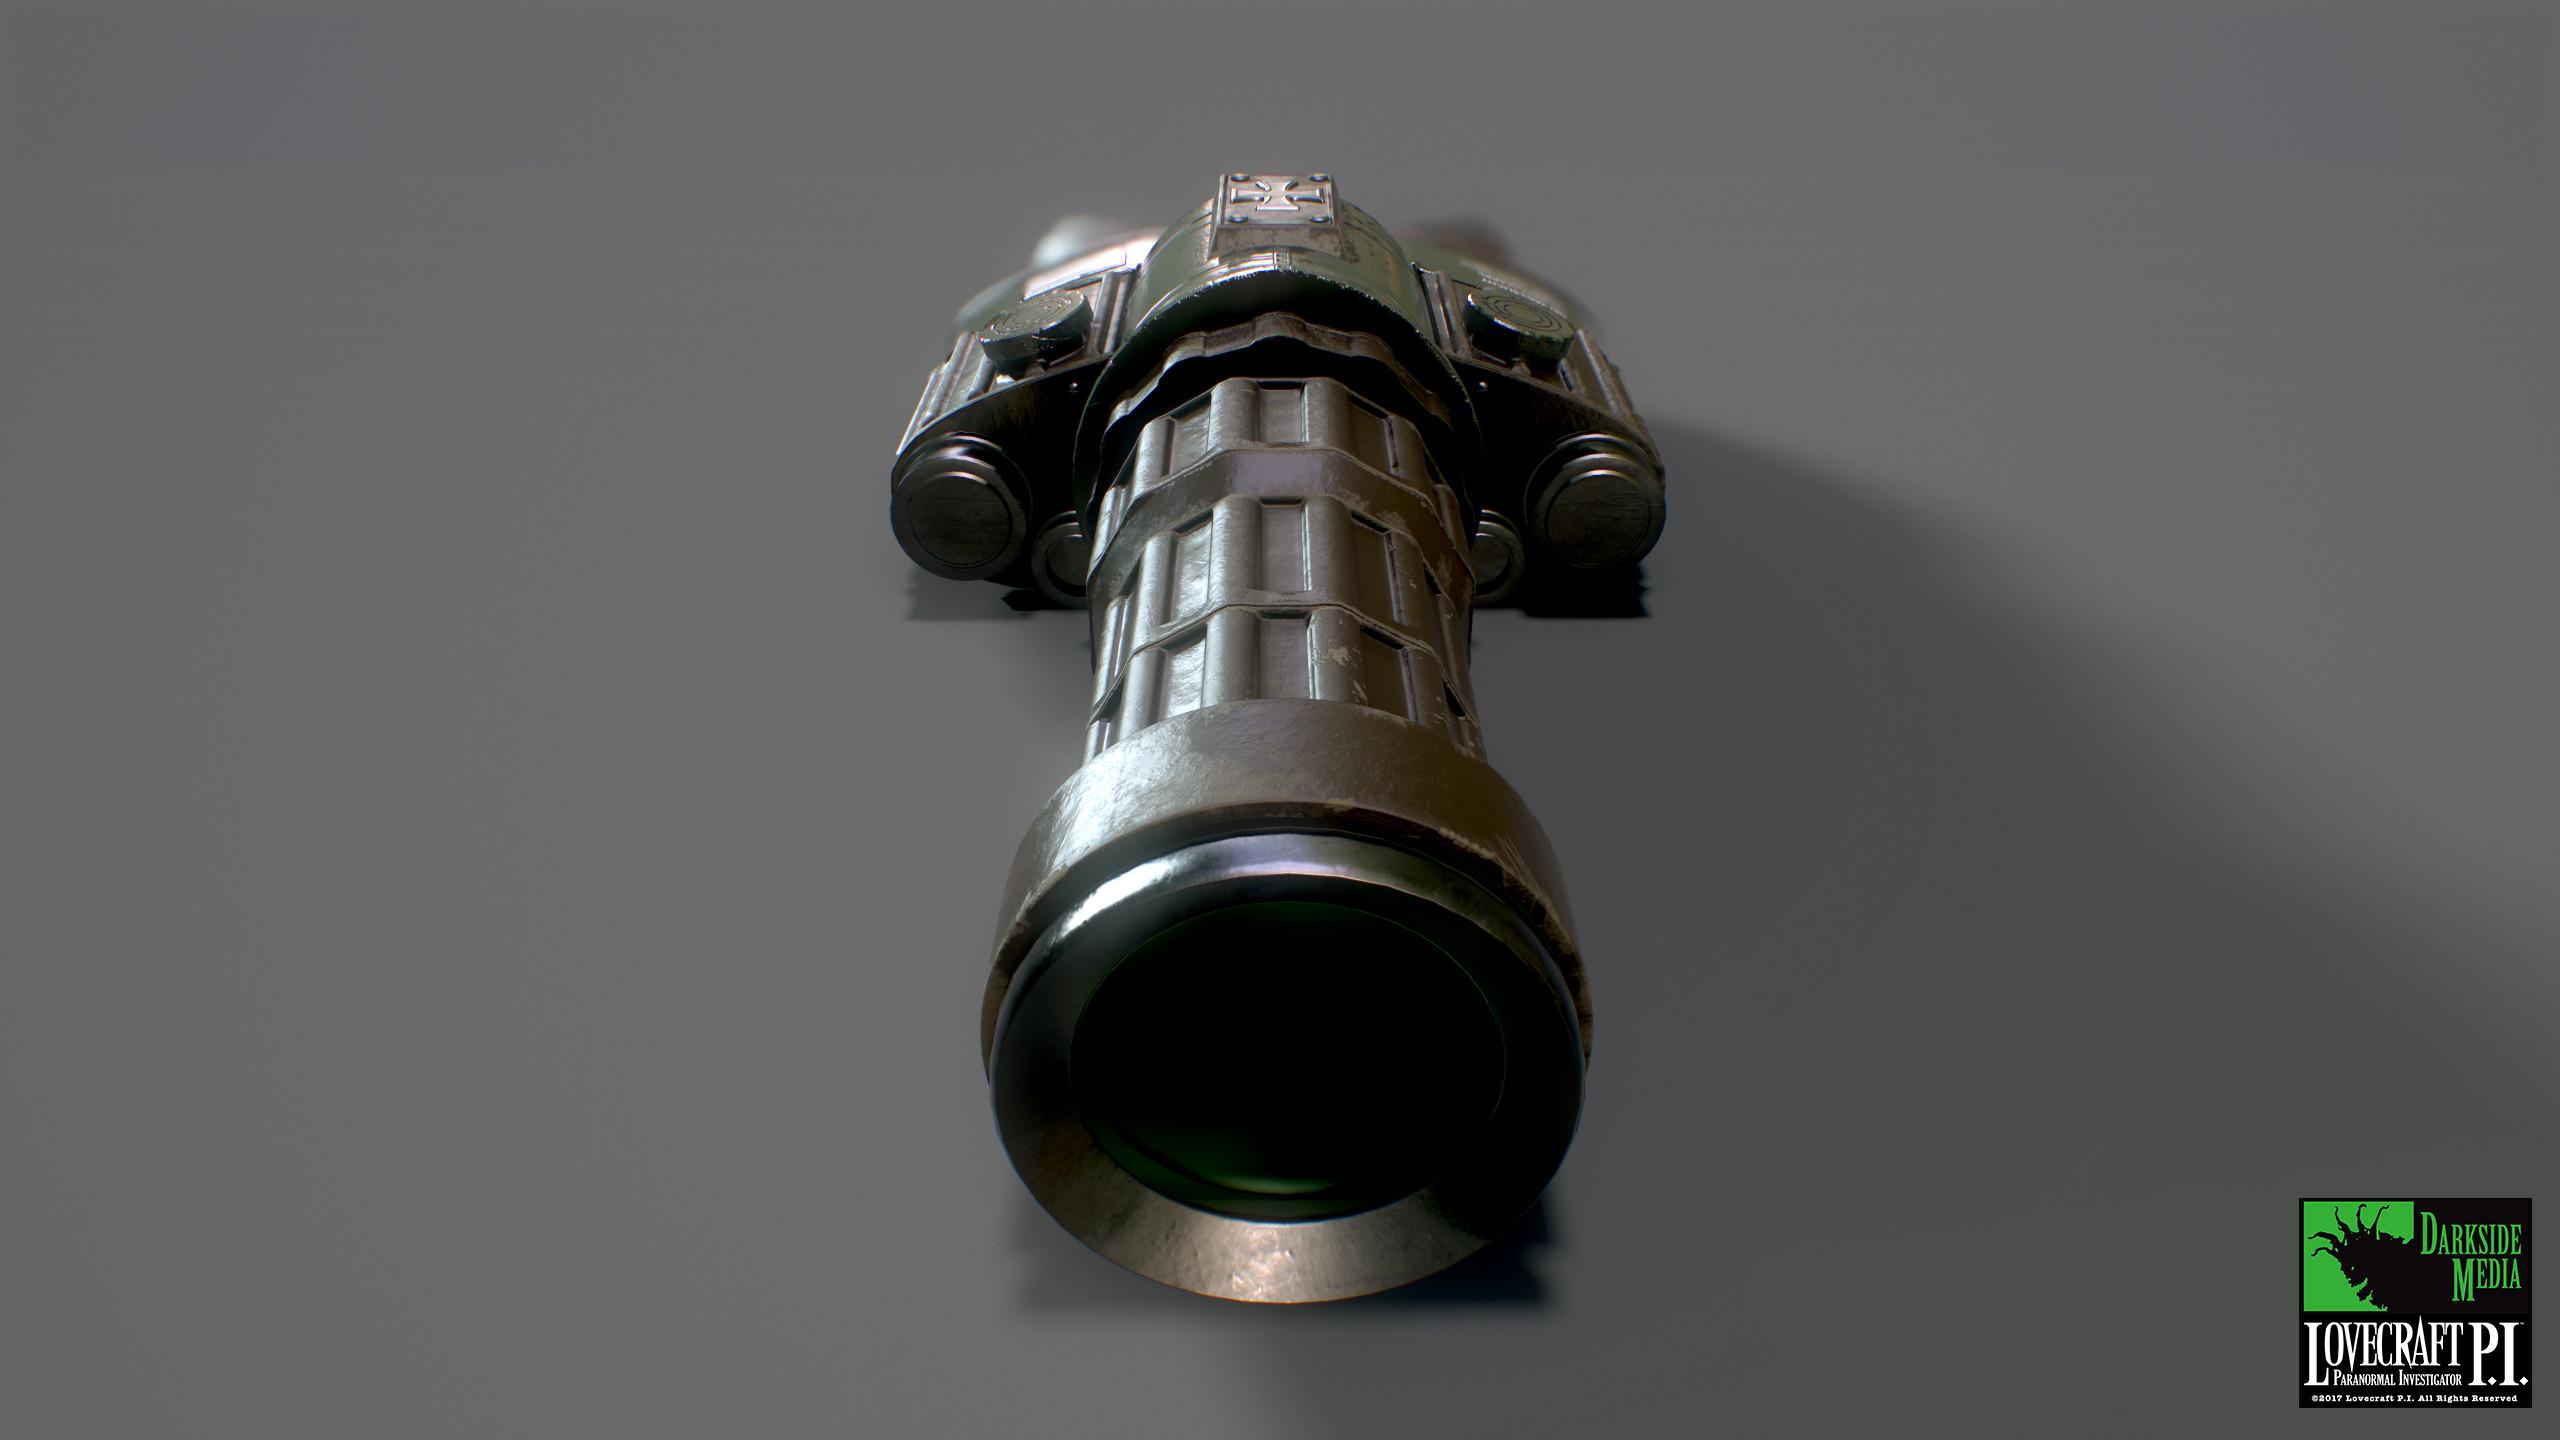 Marmoset Toolbag 3 render